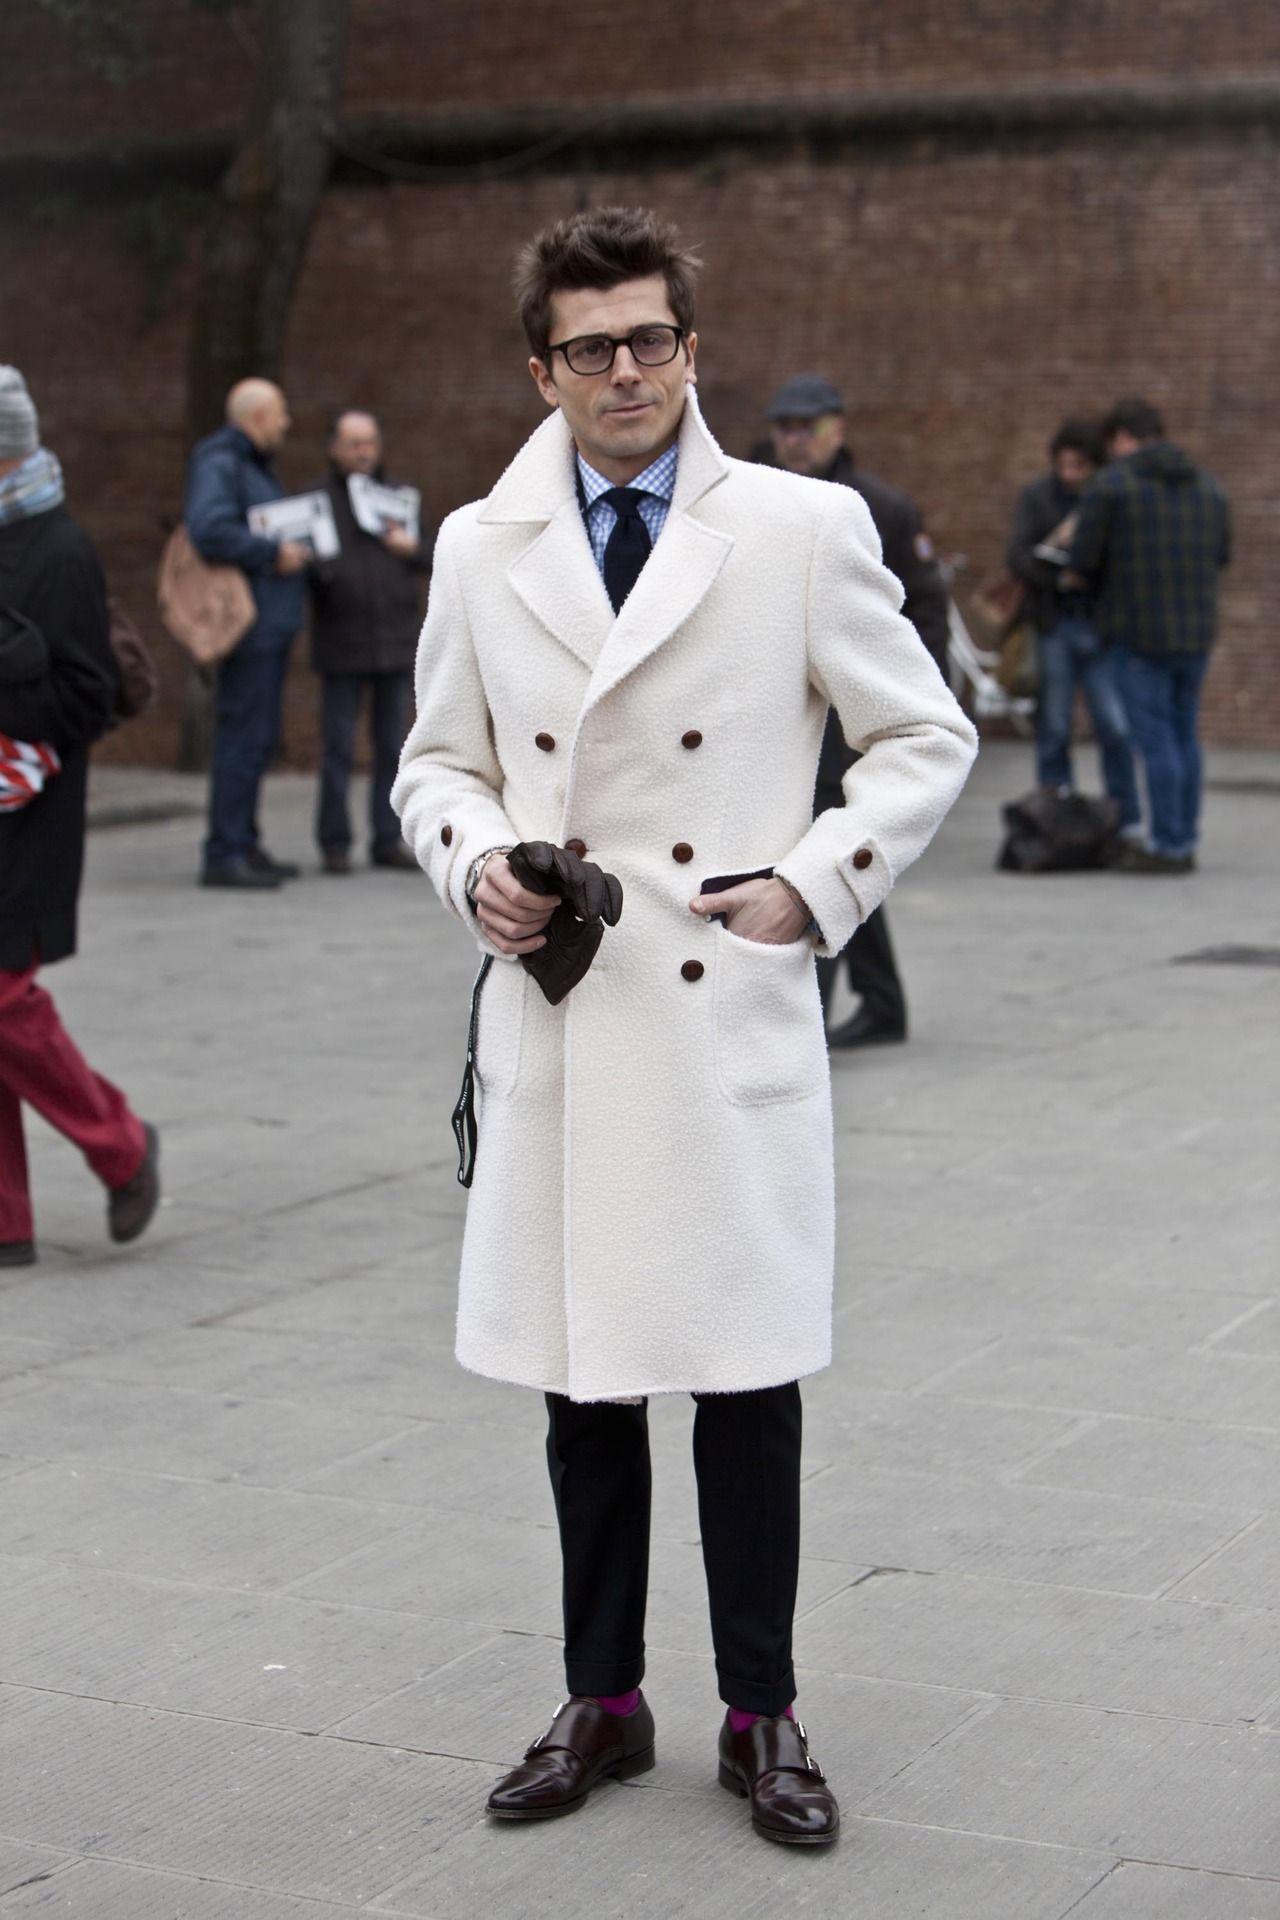 Standout jacket (especially in white) | m e n | Pinterest | Men's ...